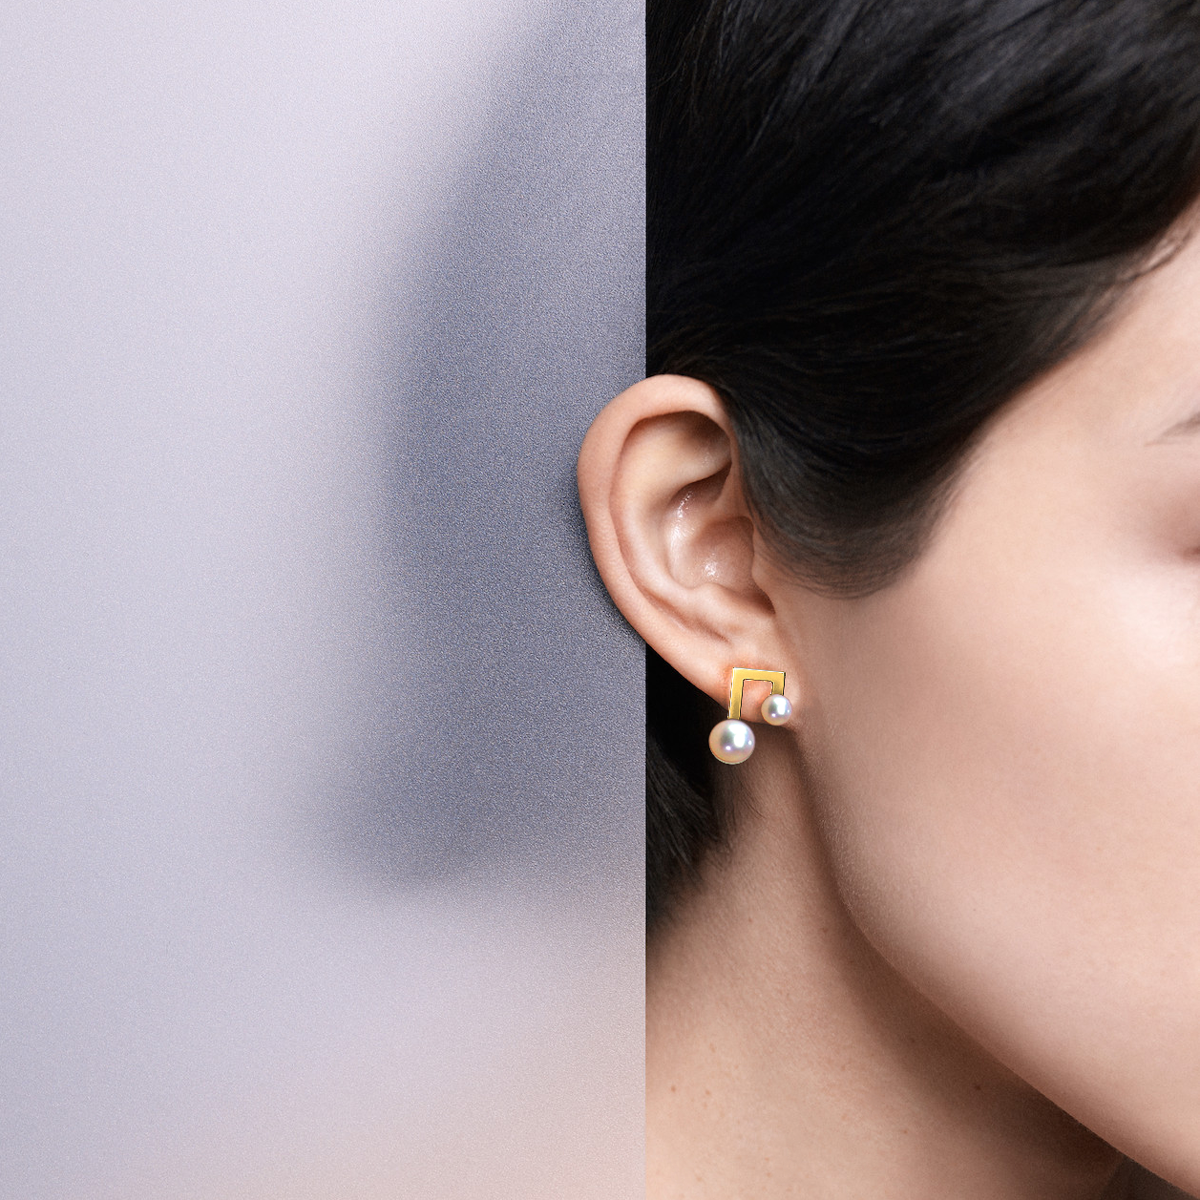 terra 情人节礼物耳钉女珍珠音符创业时代杨颖同款耳环925纯银